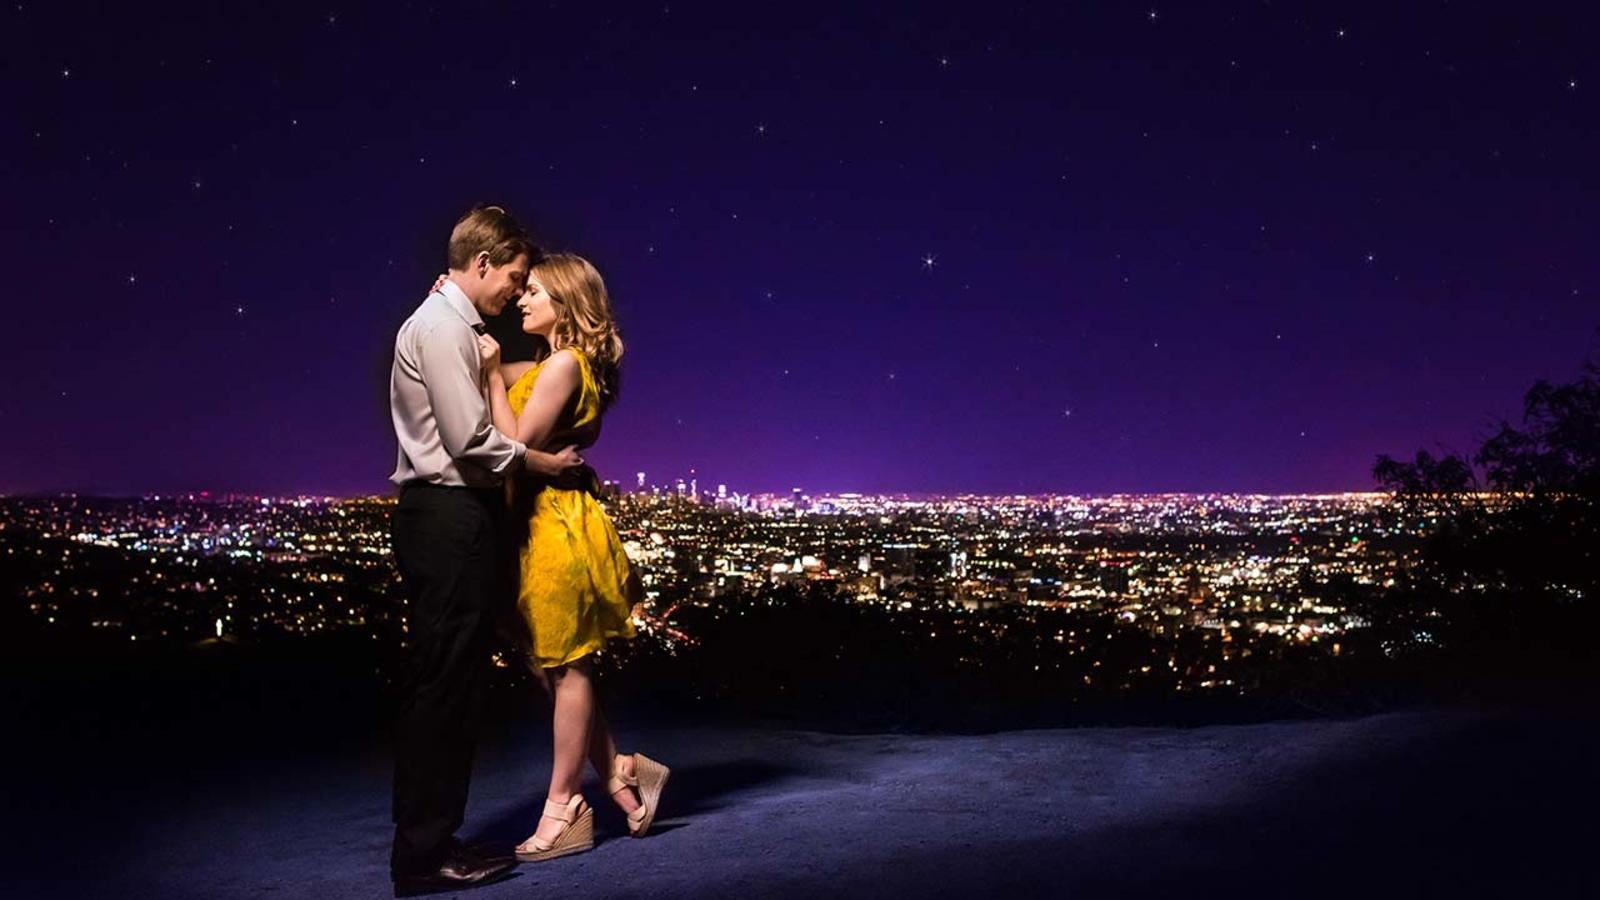 La La Land Engagement Photos Honor Love And Hollywood Abc13 Houston